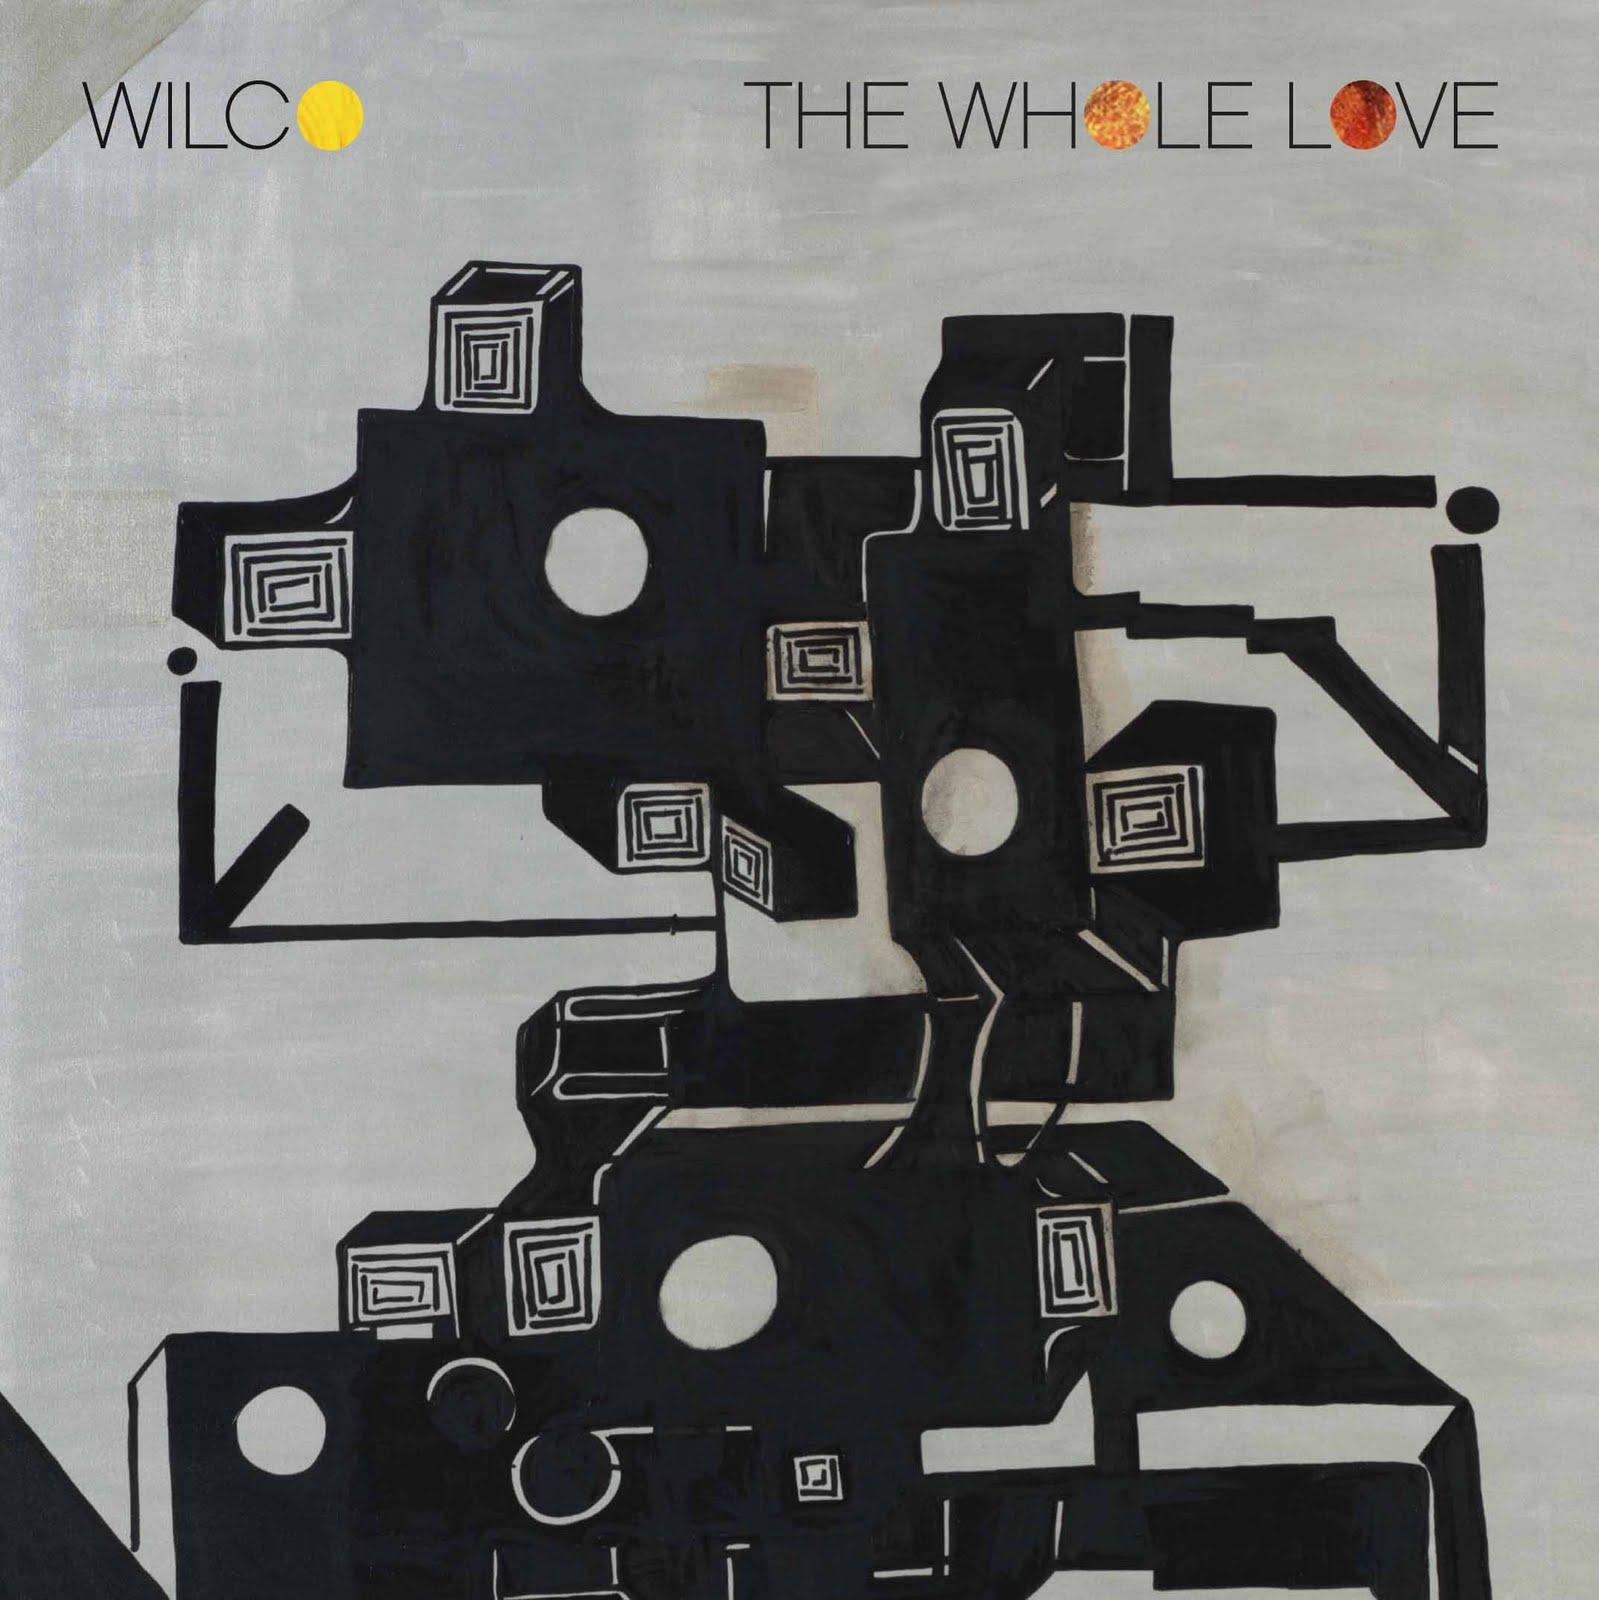 Wilco The Whole Love Troubled Souls Unite